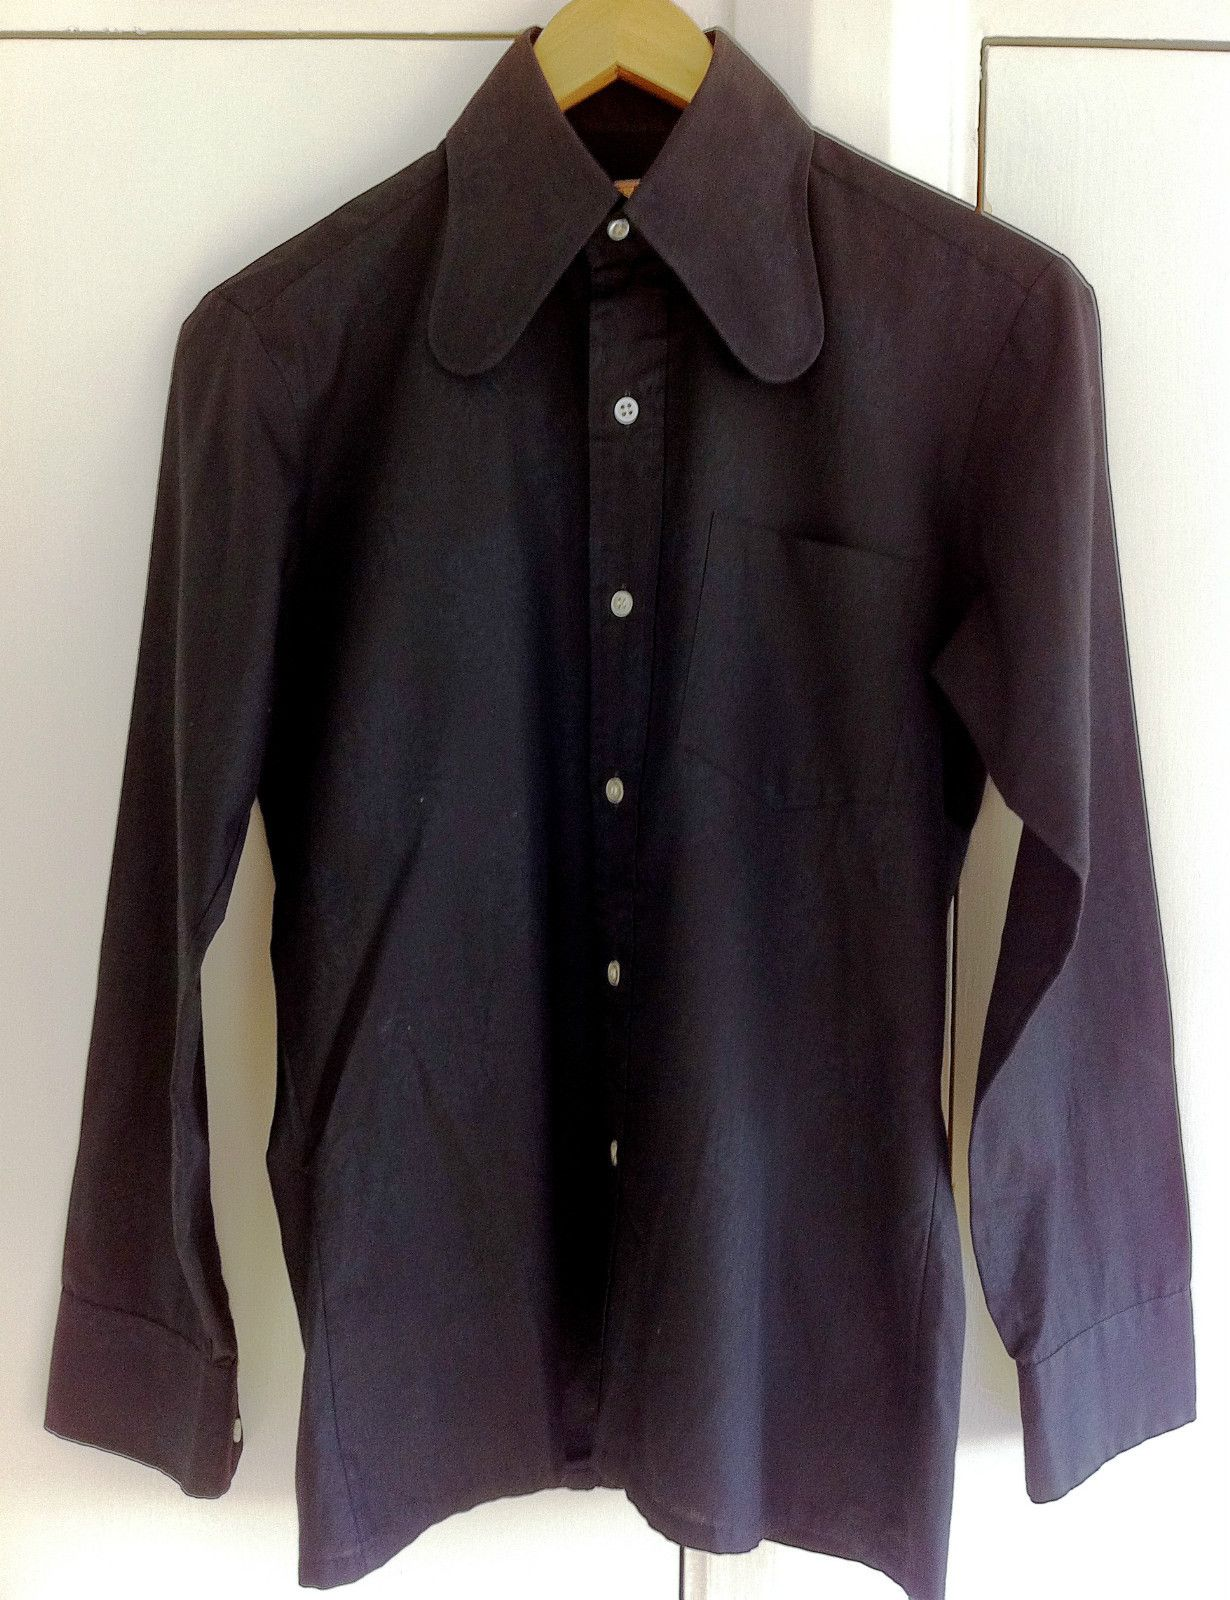 6a6c9a9e68d Why is it so hard to find beagle collared shirts